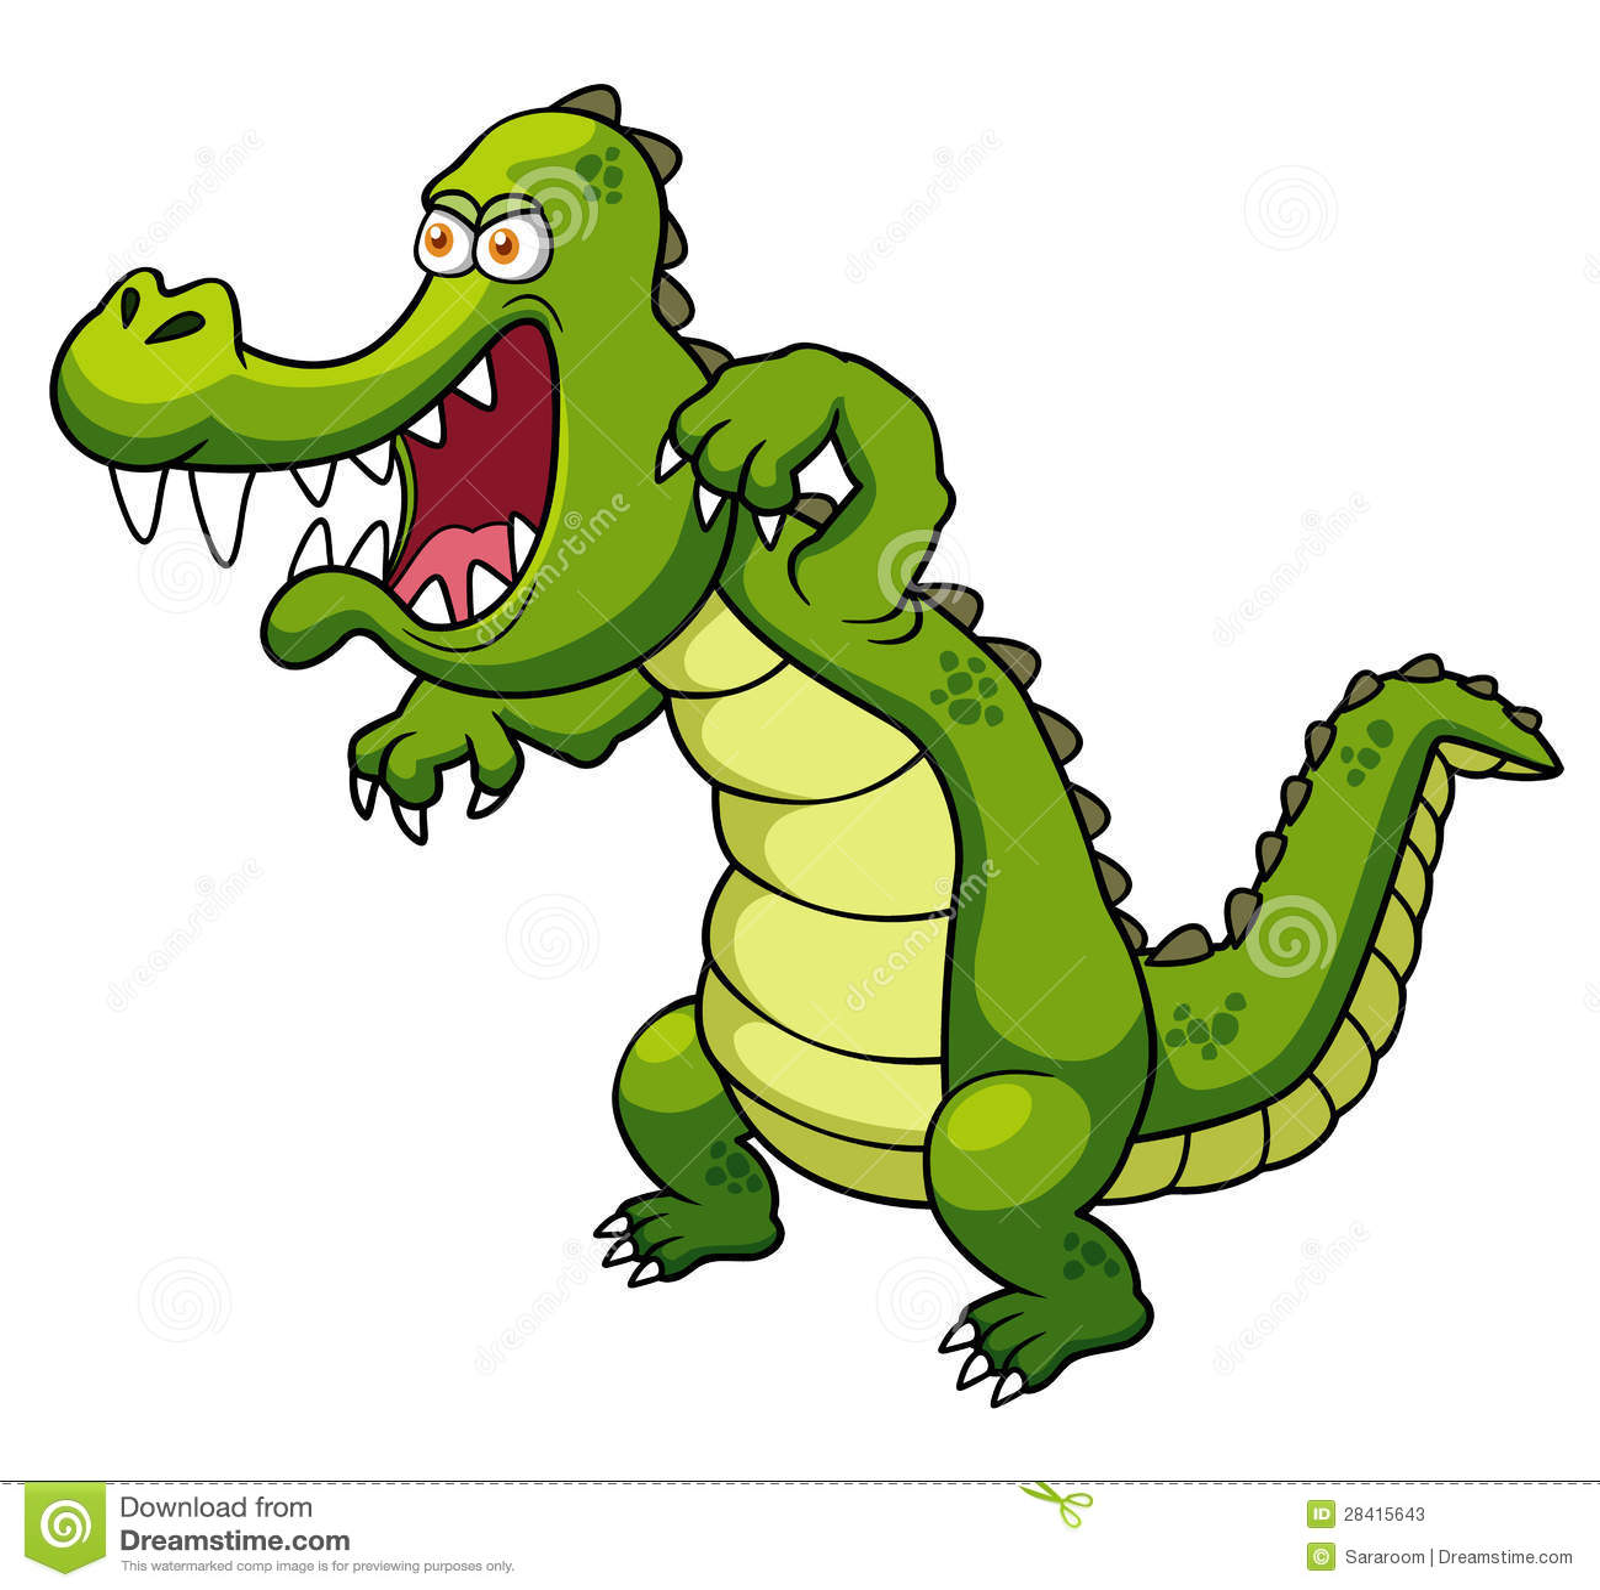 Cartoon crocodile stock vector. Illustration of crocodile ... - photo#39